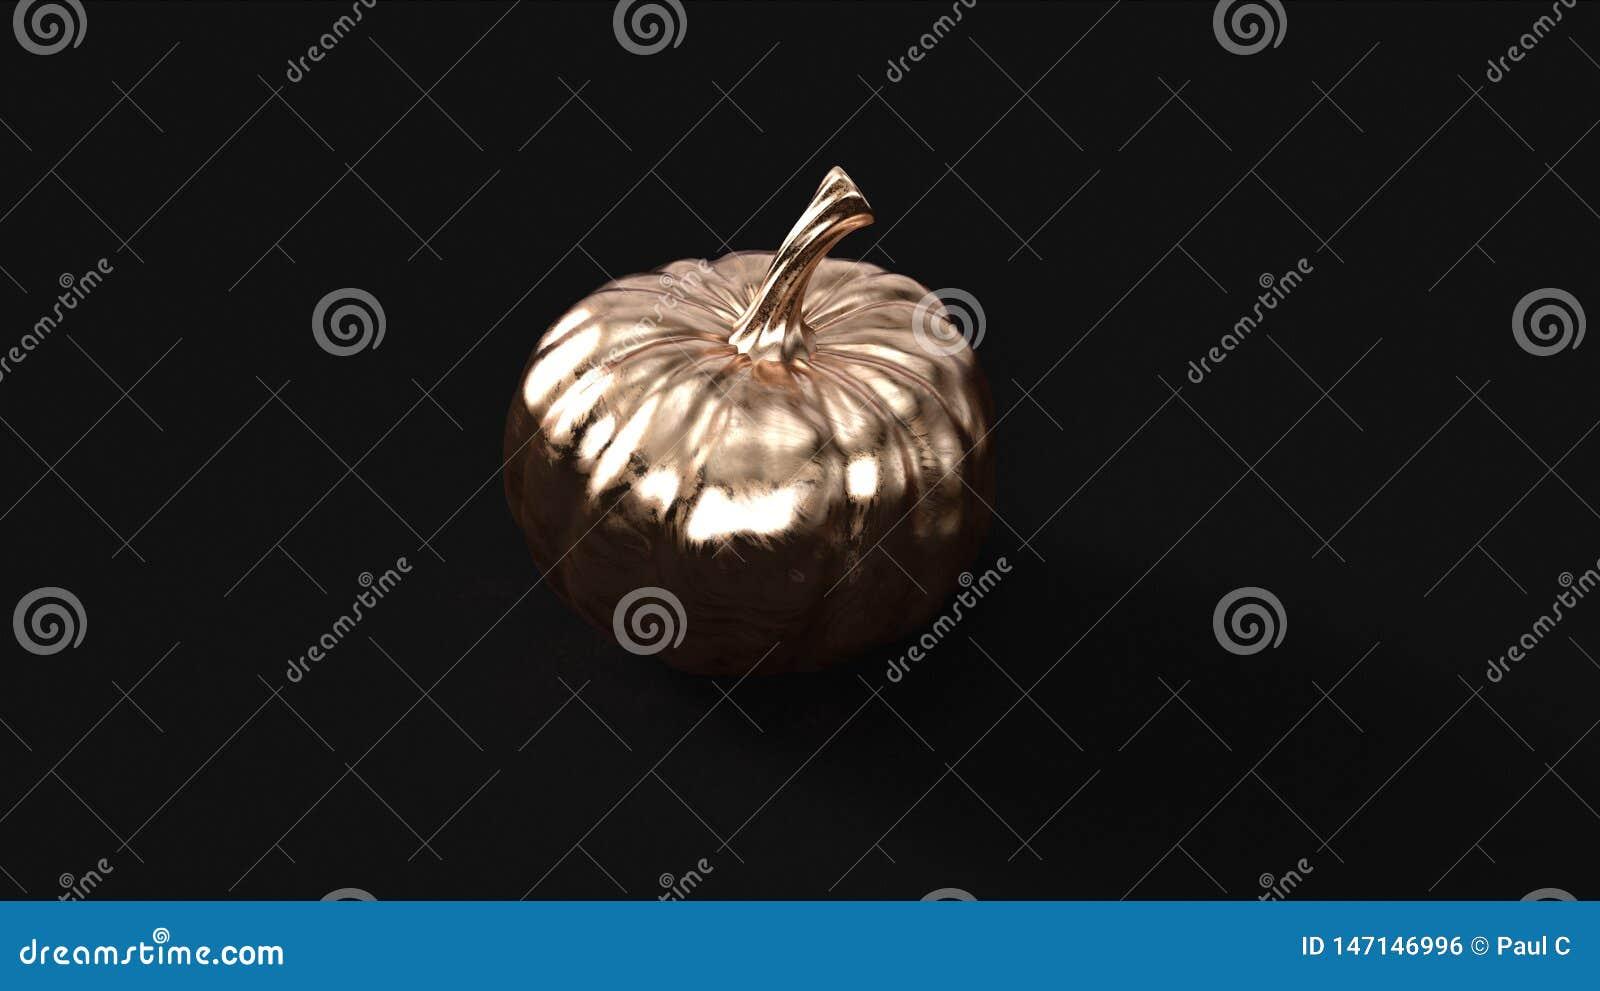 Bronzemessingkürbis